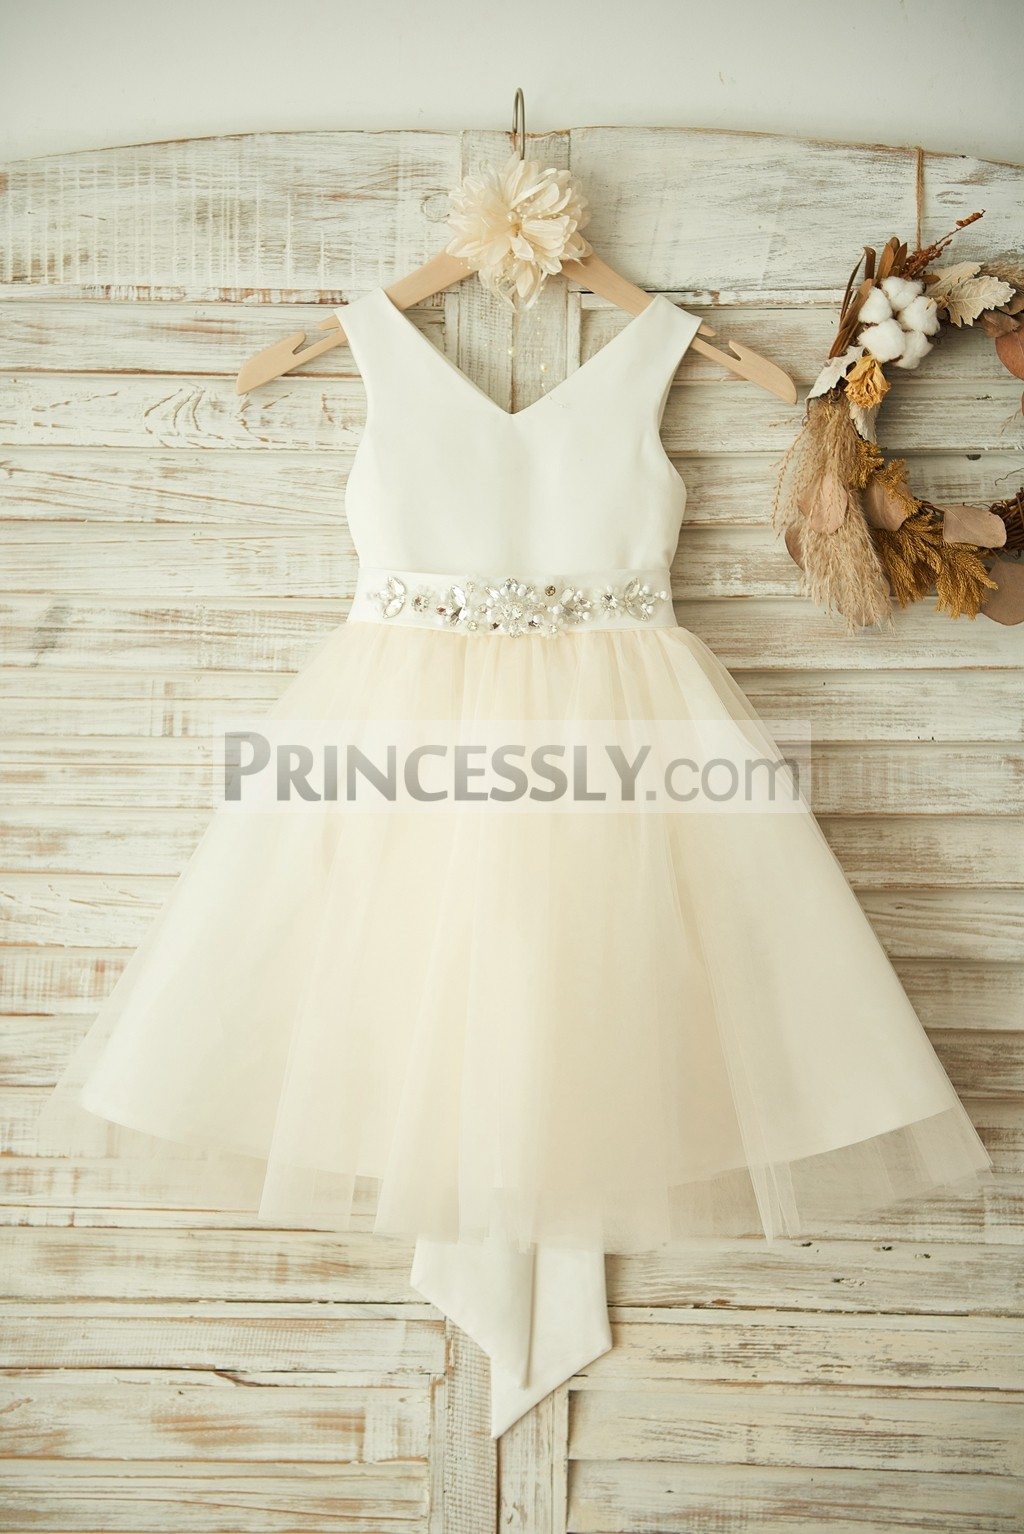 Princessly.com-K1003363-V Neck Ivory Satin Champagne Tulle Wedding Flower Girl Dress with Beaded Belt-31